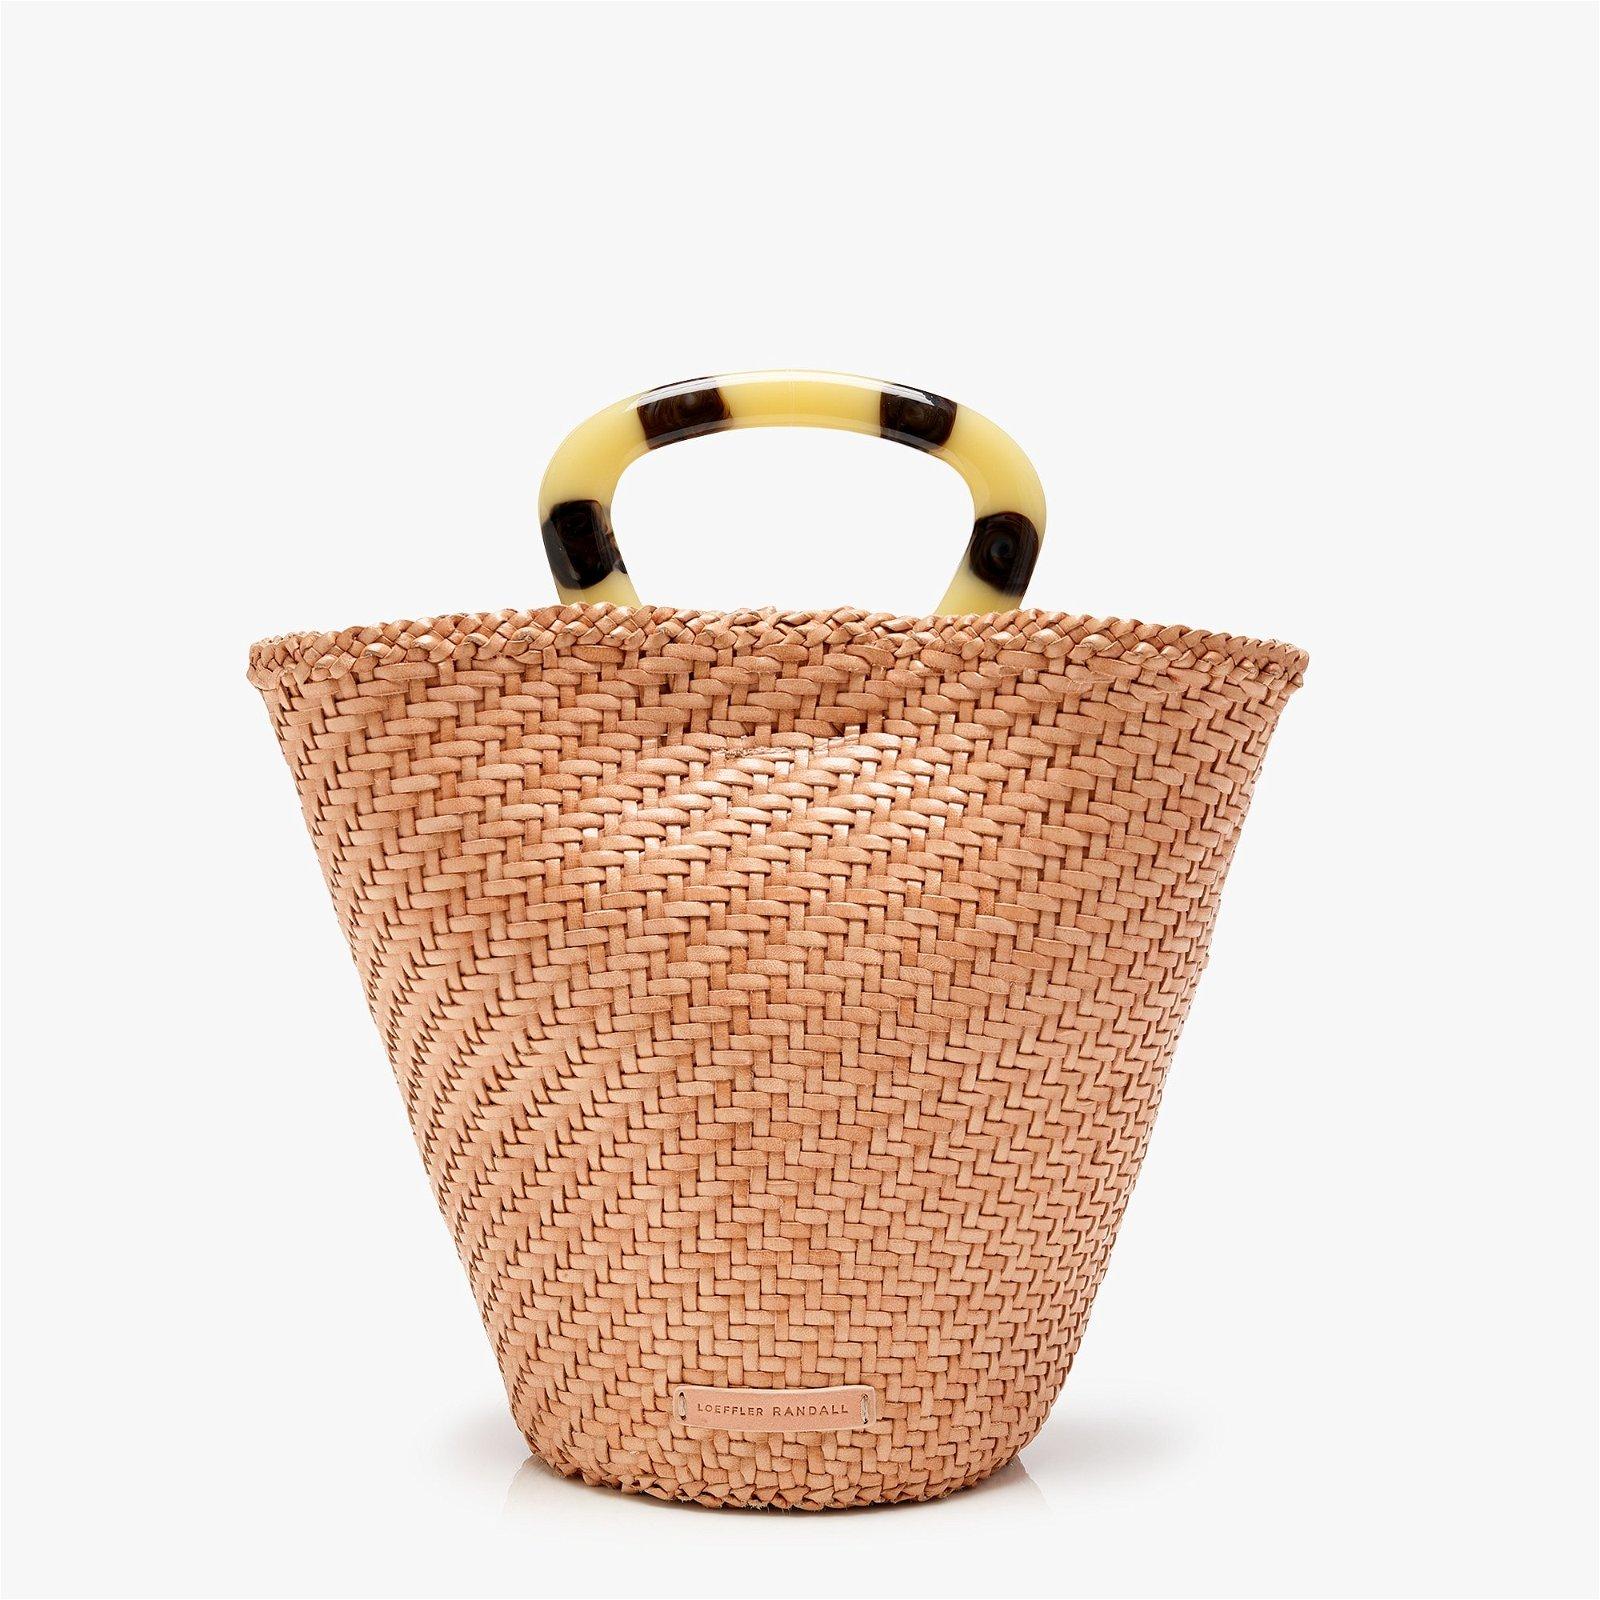 Loeffler Randall® Agnes Woven Fan Tote Bag in blush